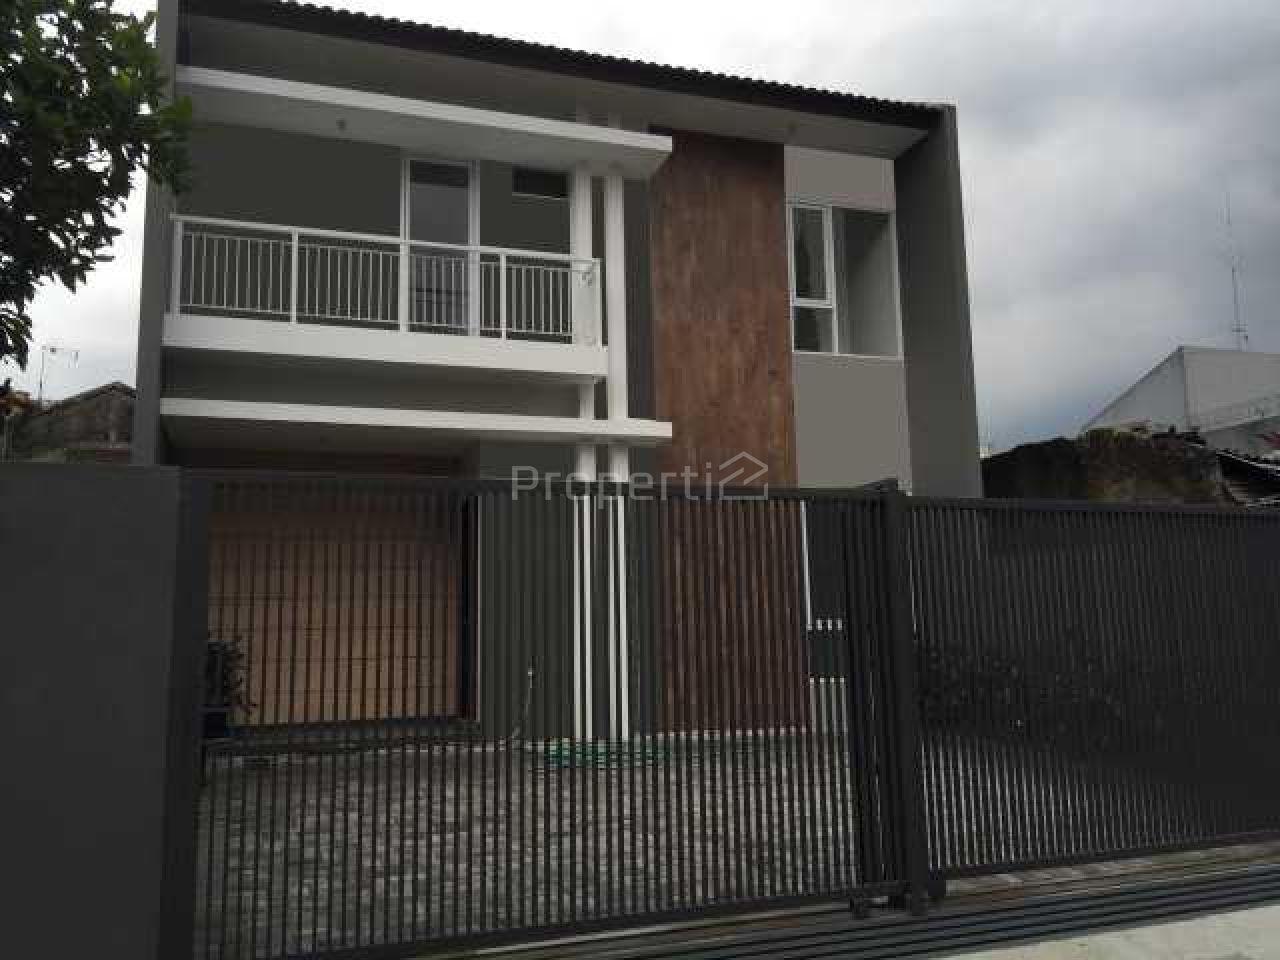 Rumah Modern di Regol, Kota Bandung, Jawa Barat